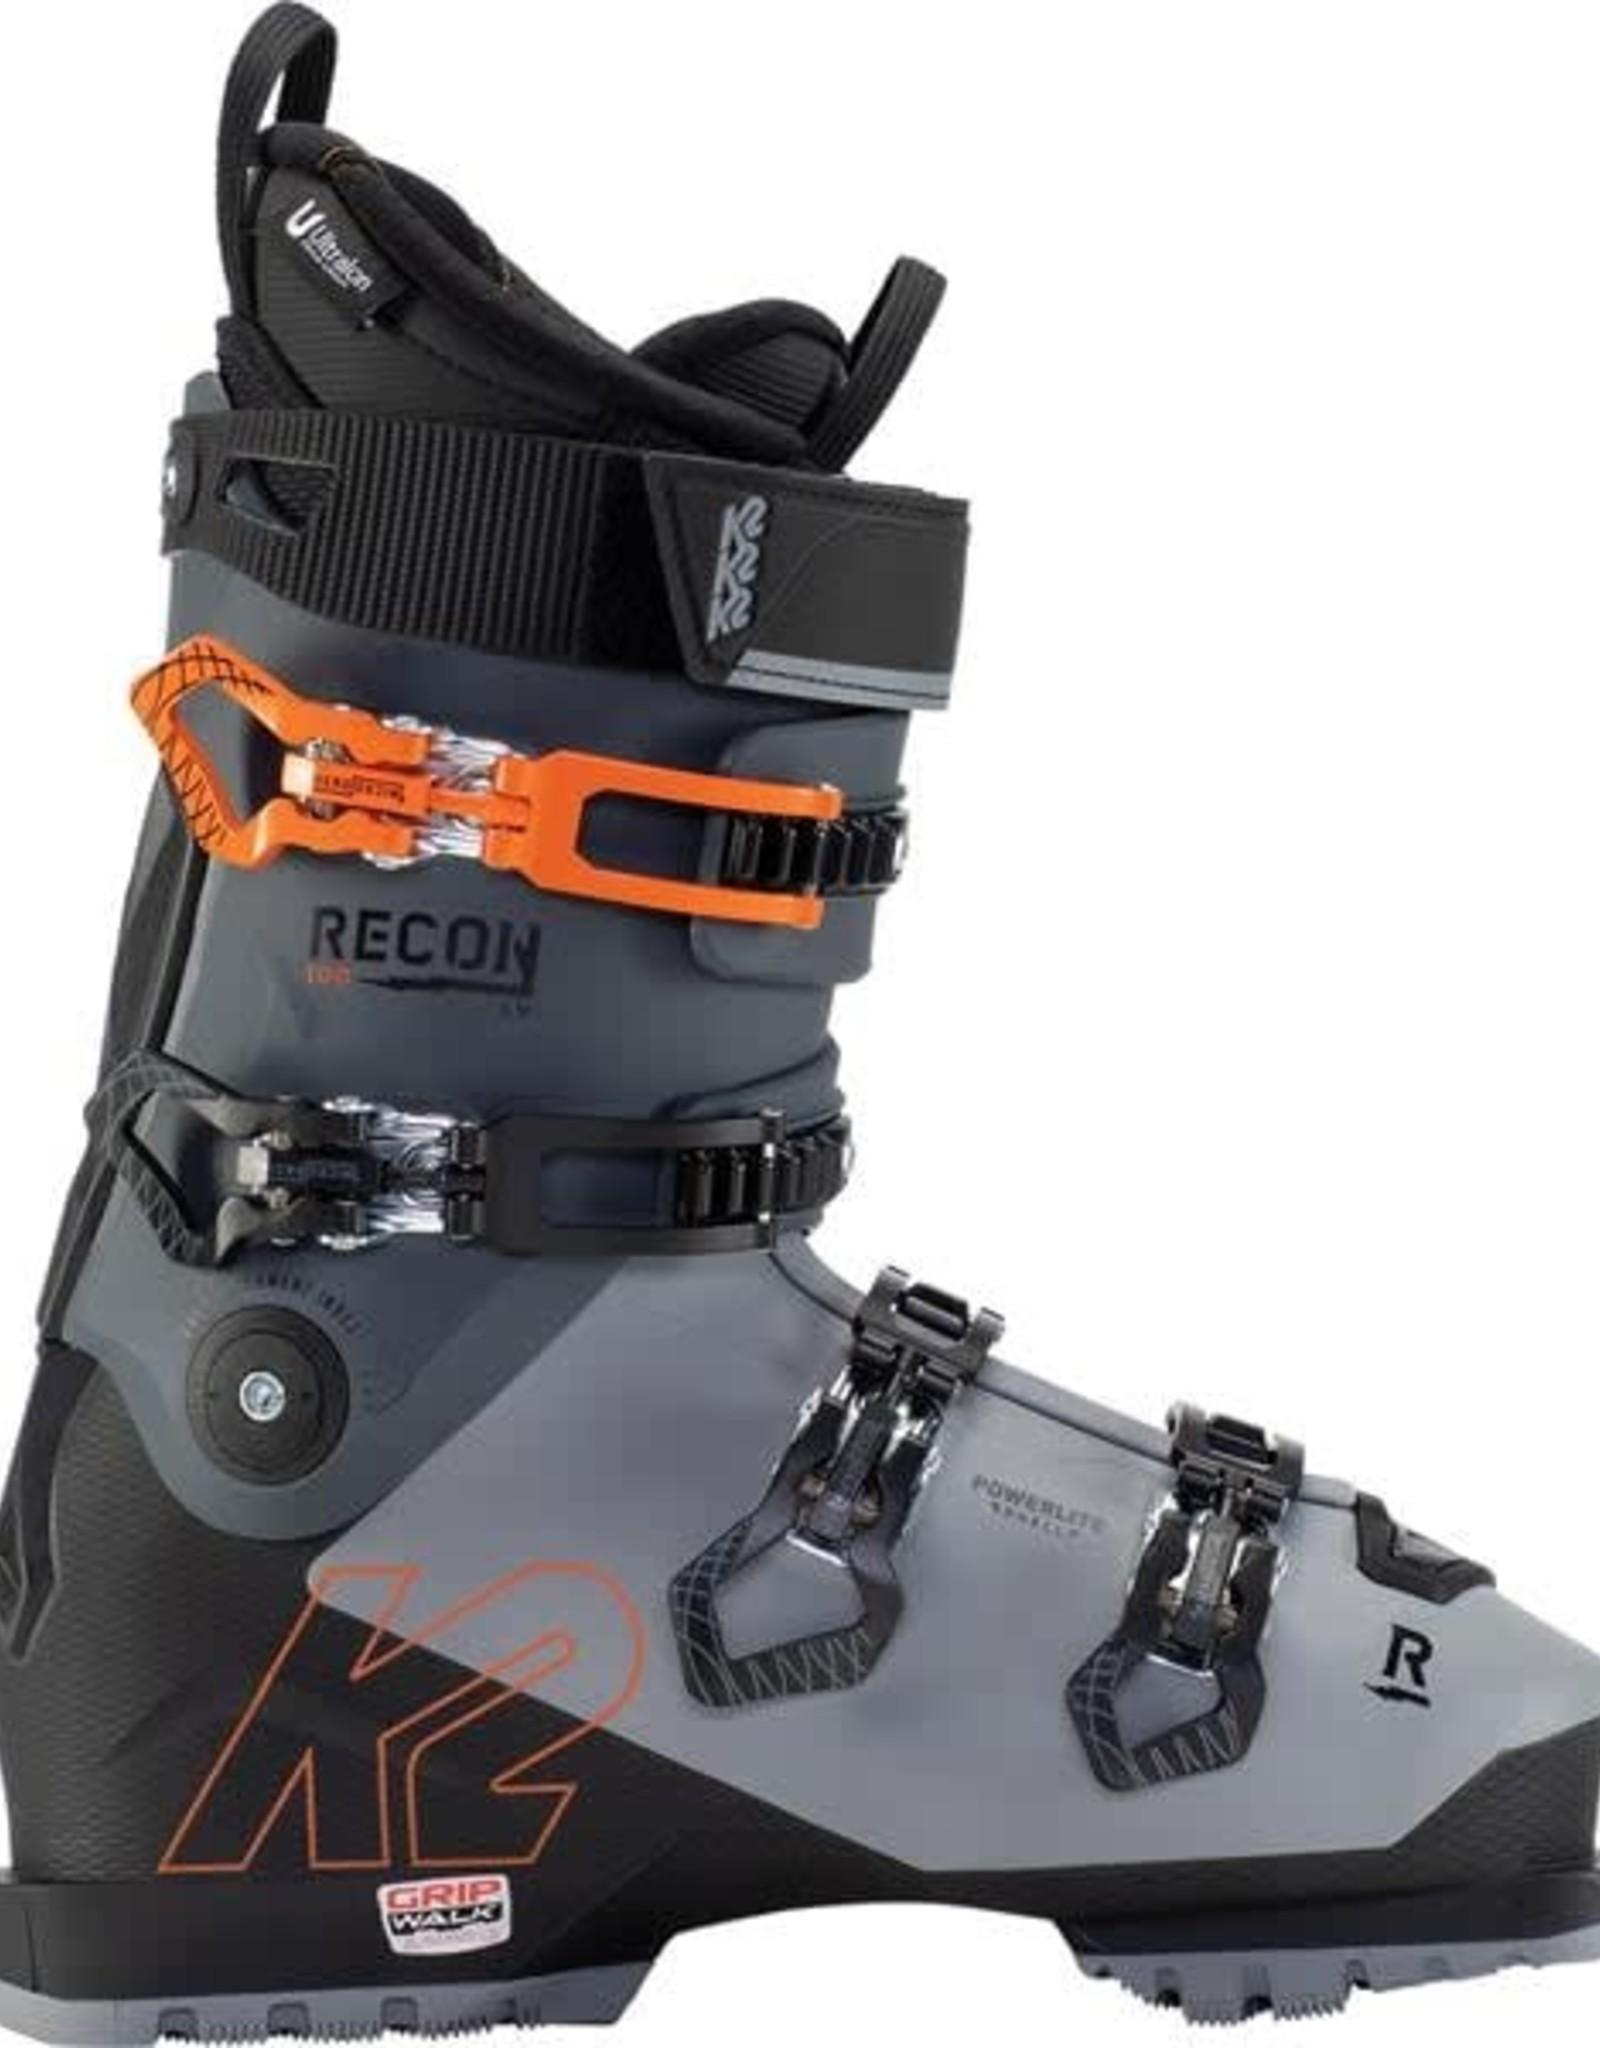 K2 K2 Ski Boots RECON 100 MV (21/22)